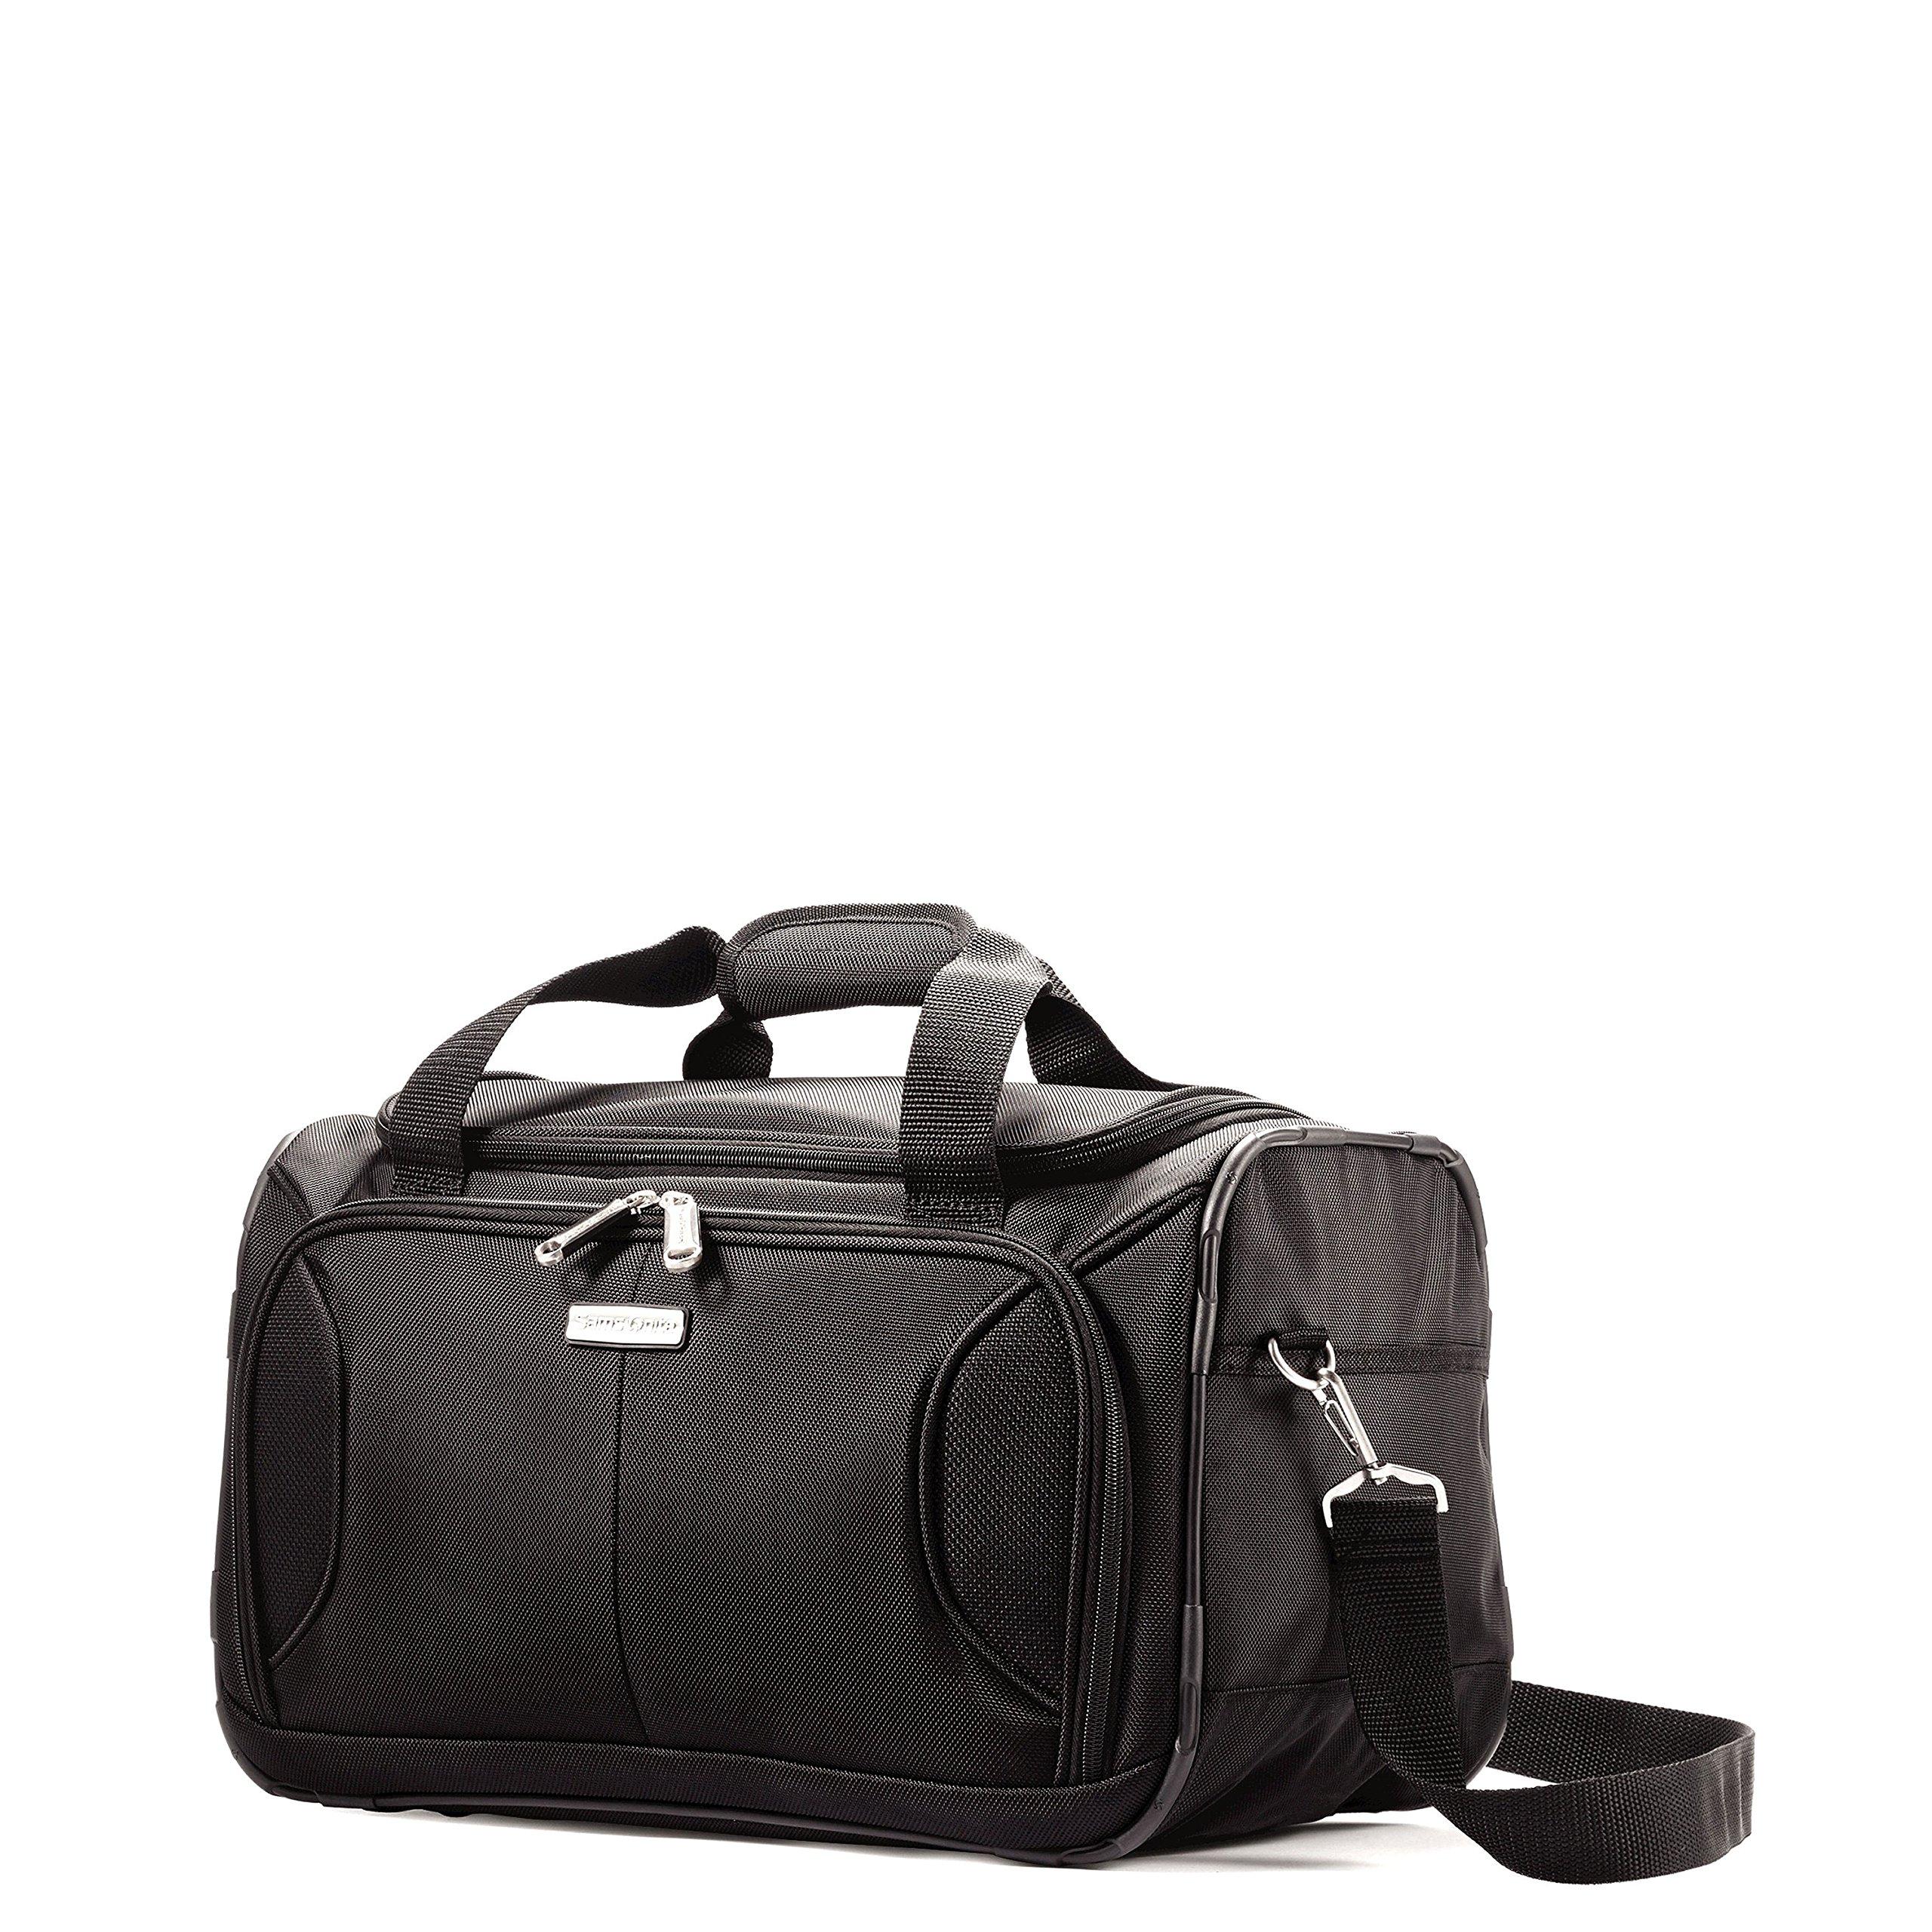 Samsonite Aspire Xlite Boarding Bag, Black